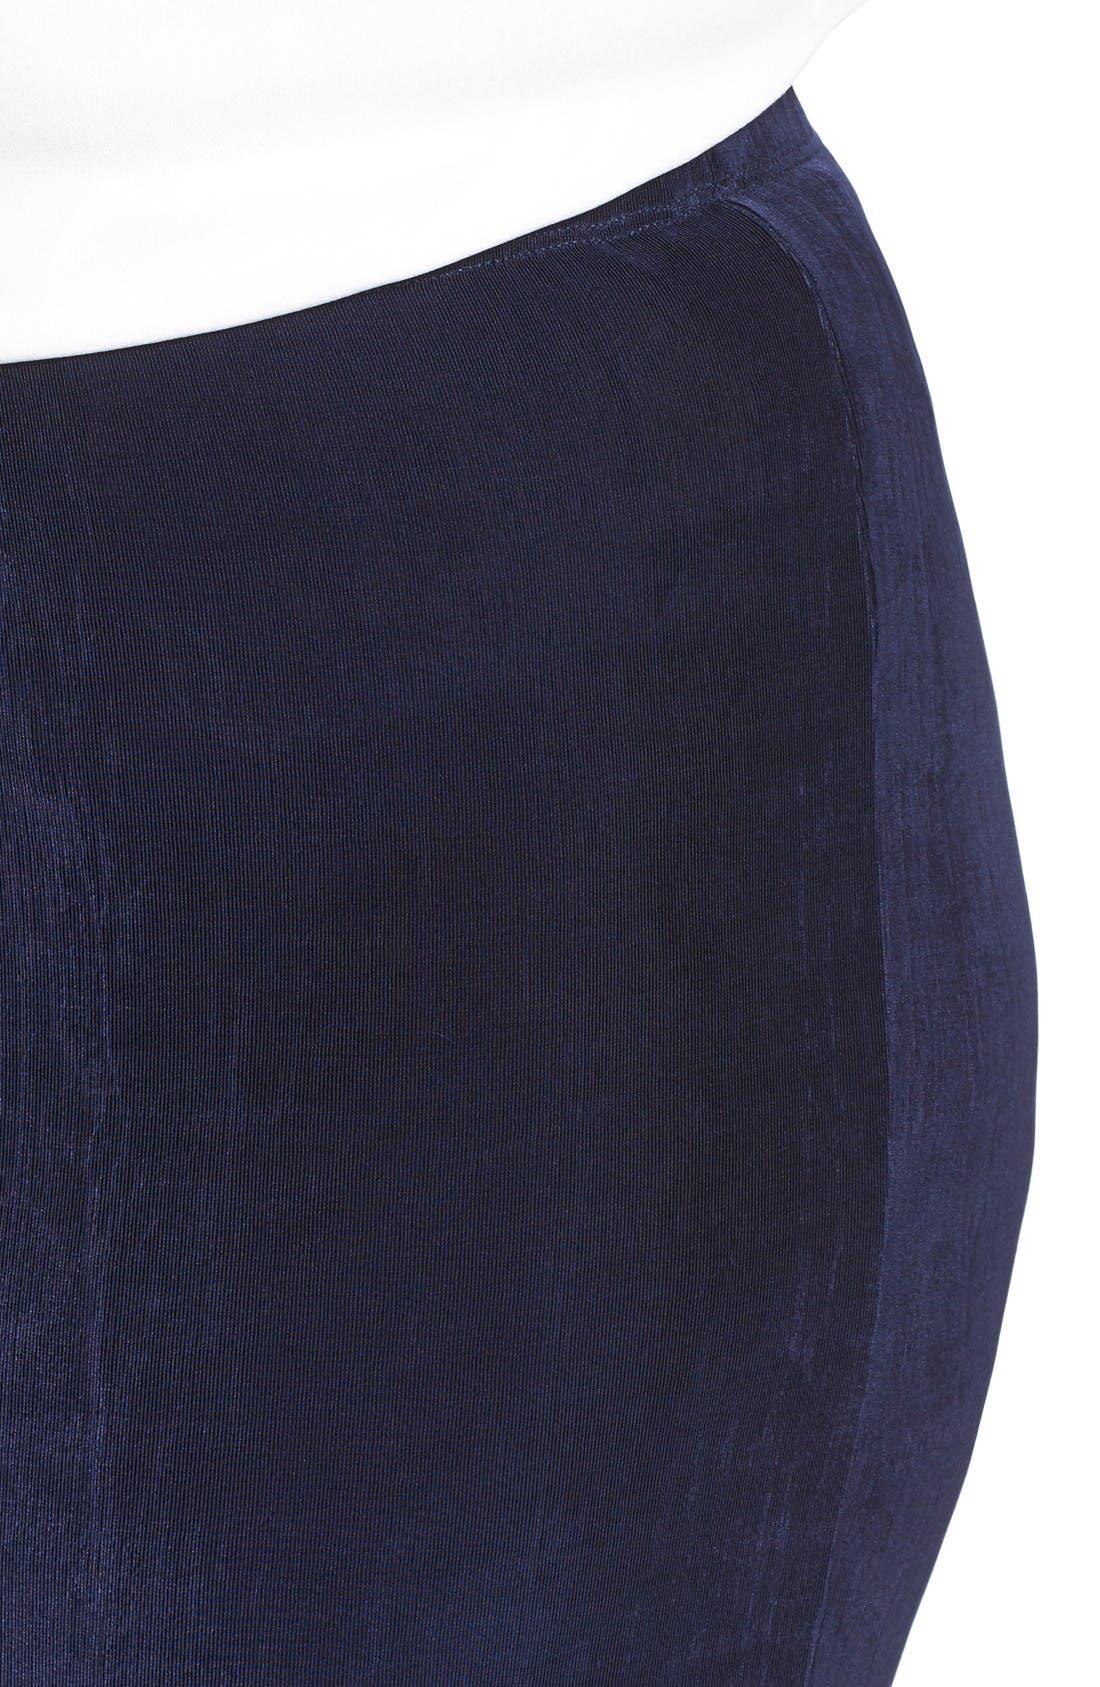 Alternate Image 4  - Vikki Vi Stretch Knit Crop Pants (Plus Size)